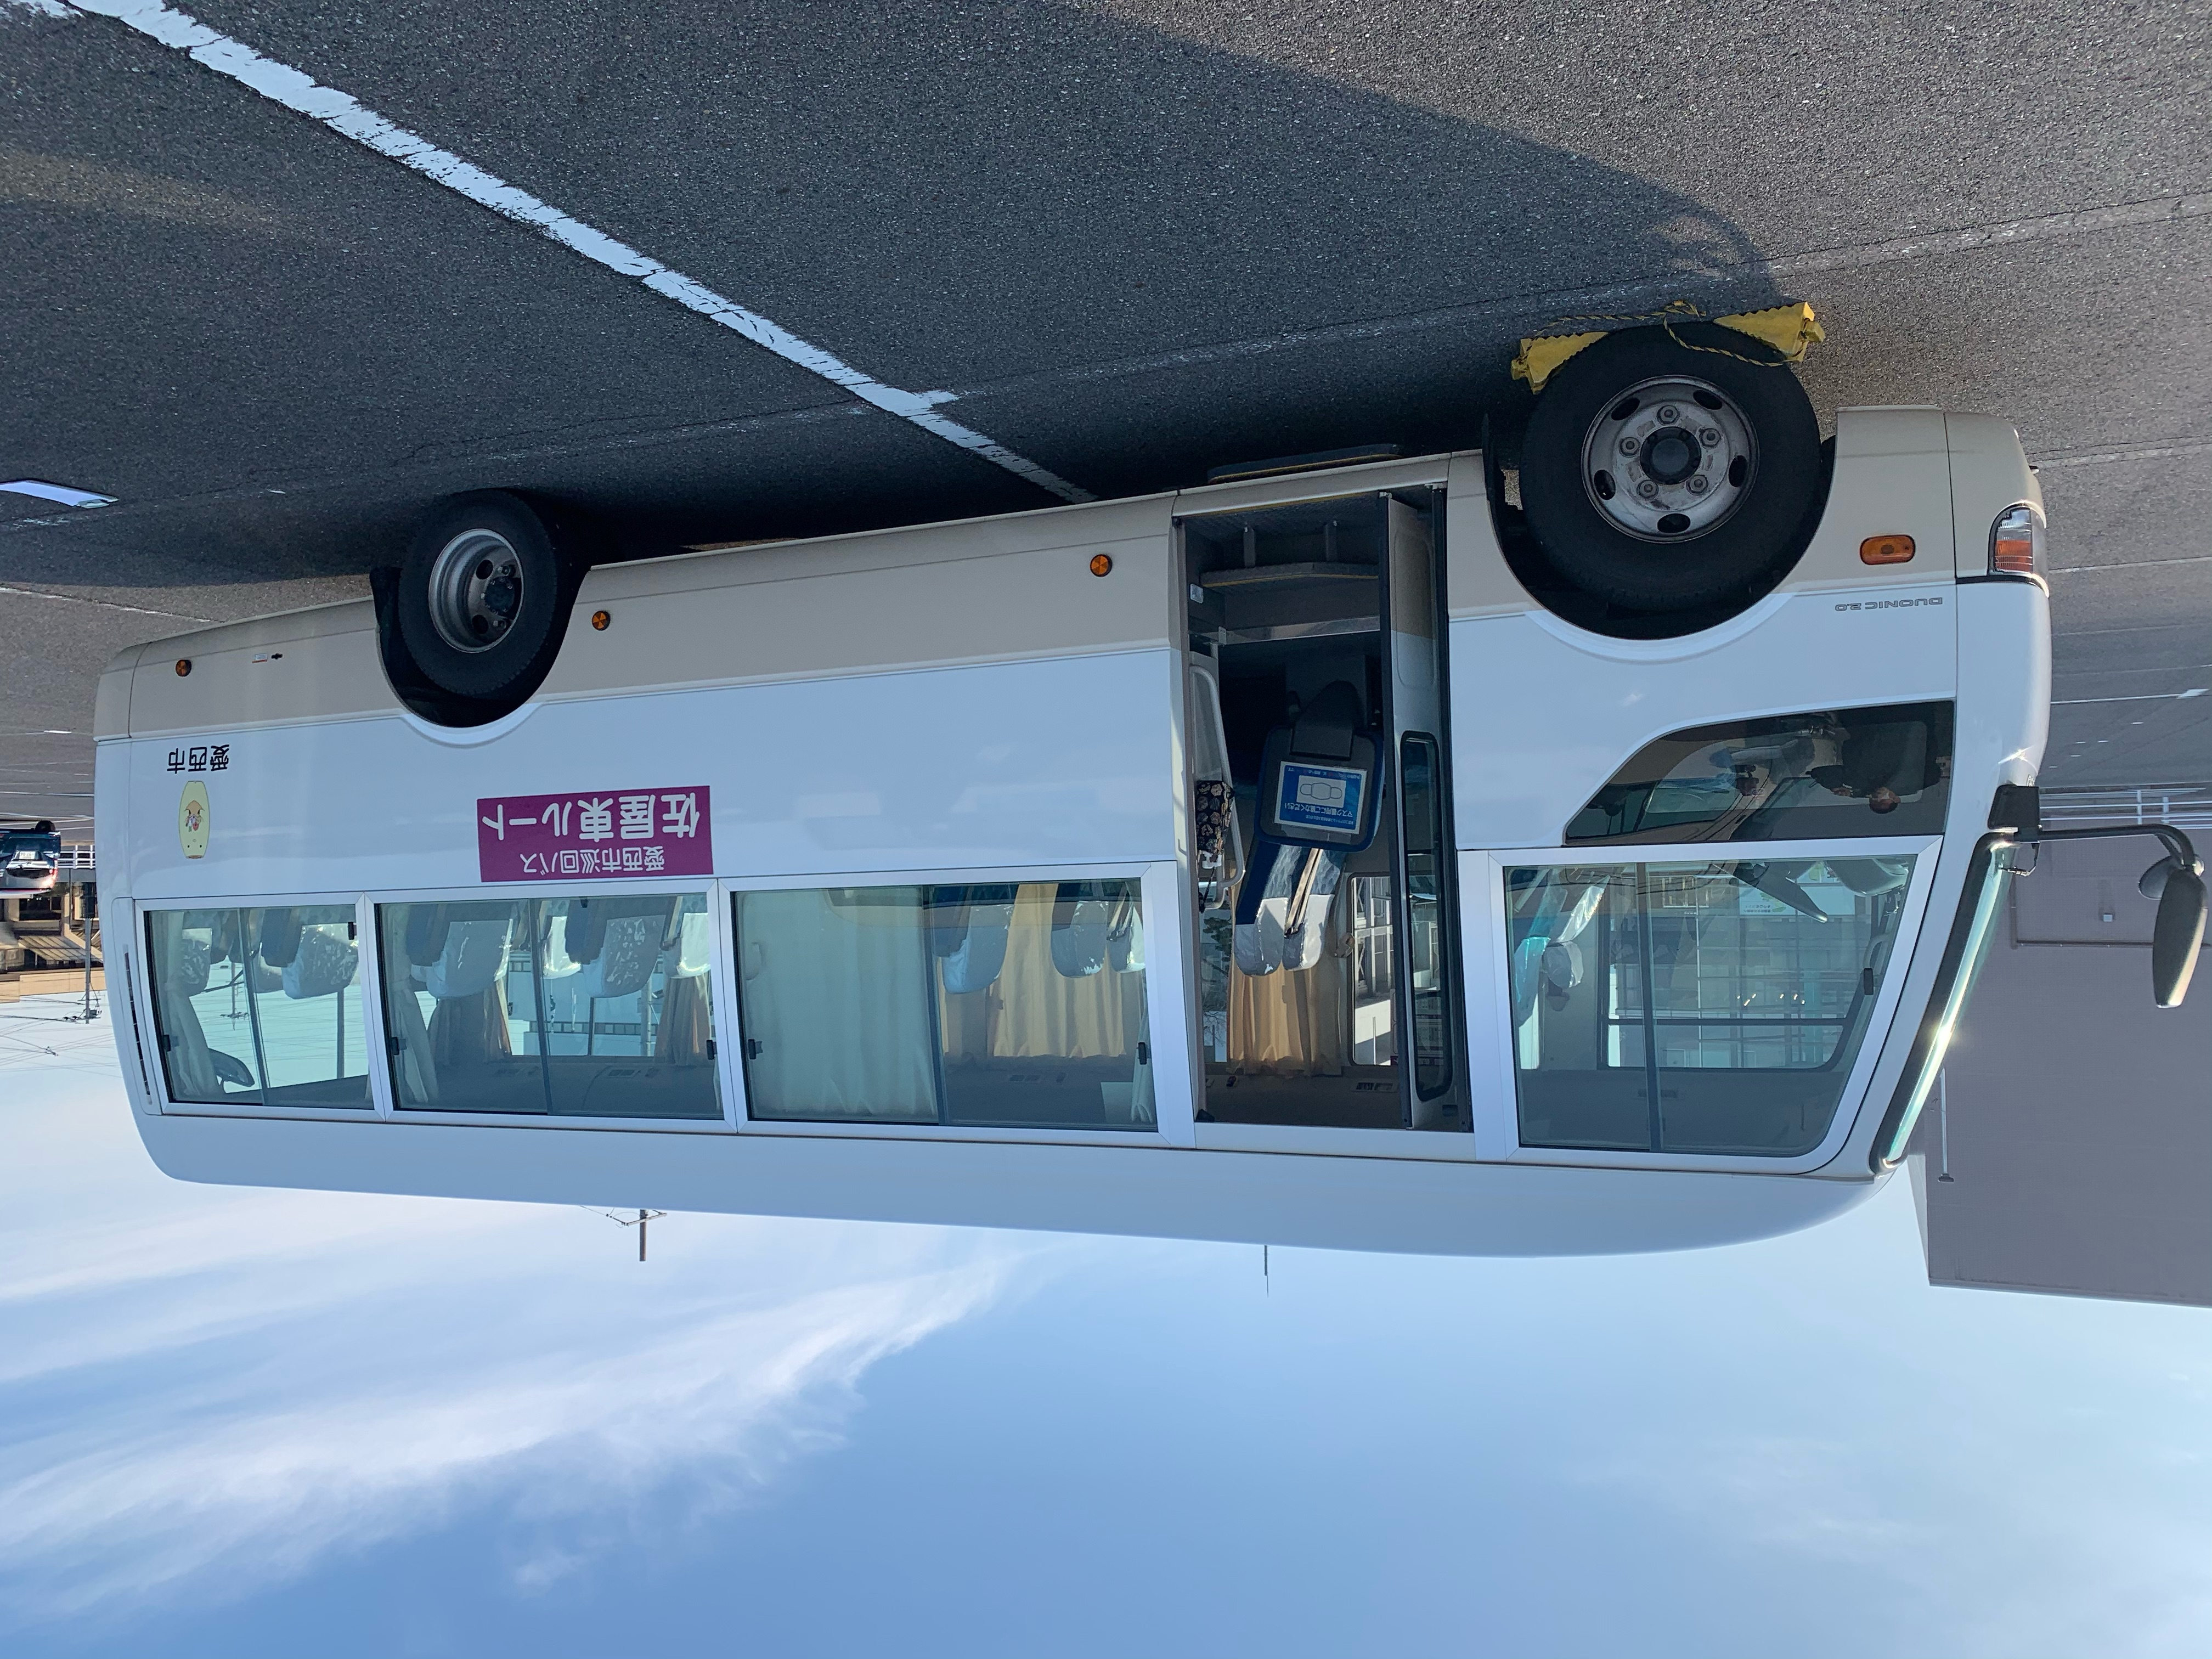 愛西市巡回バス